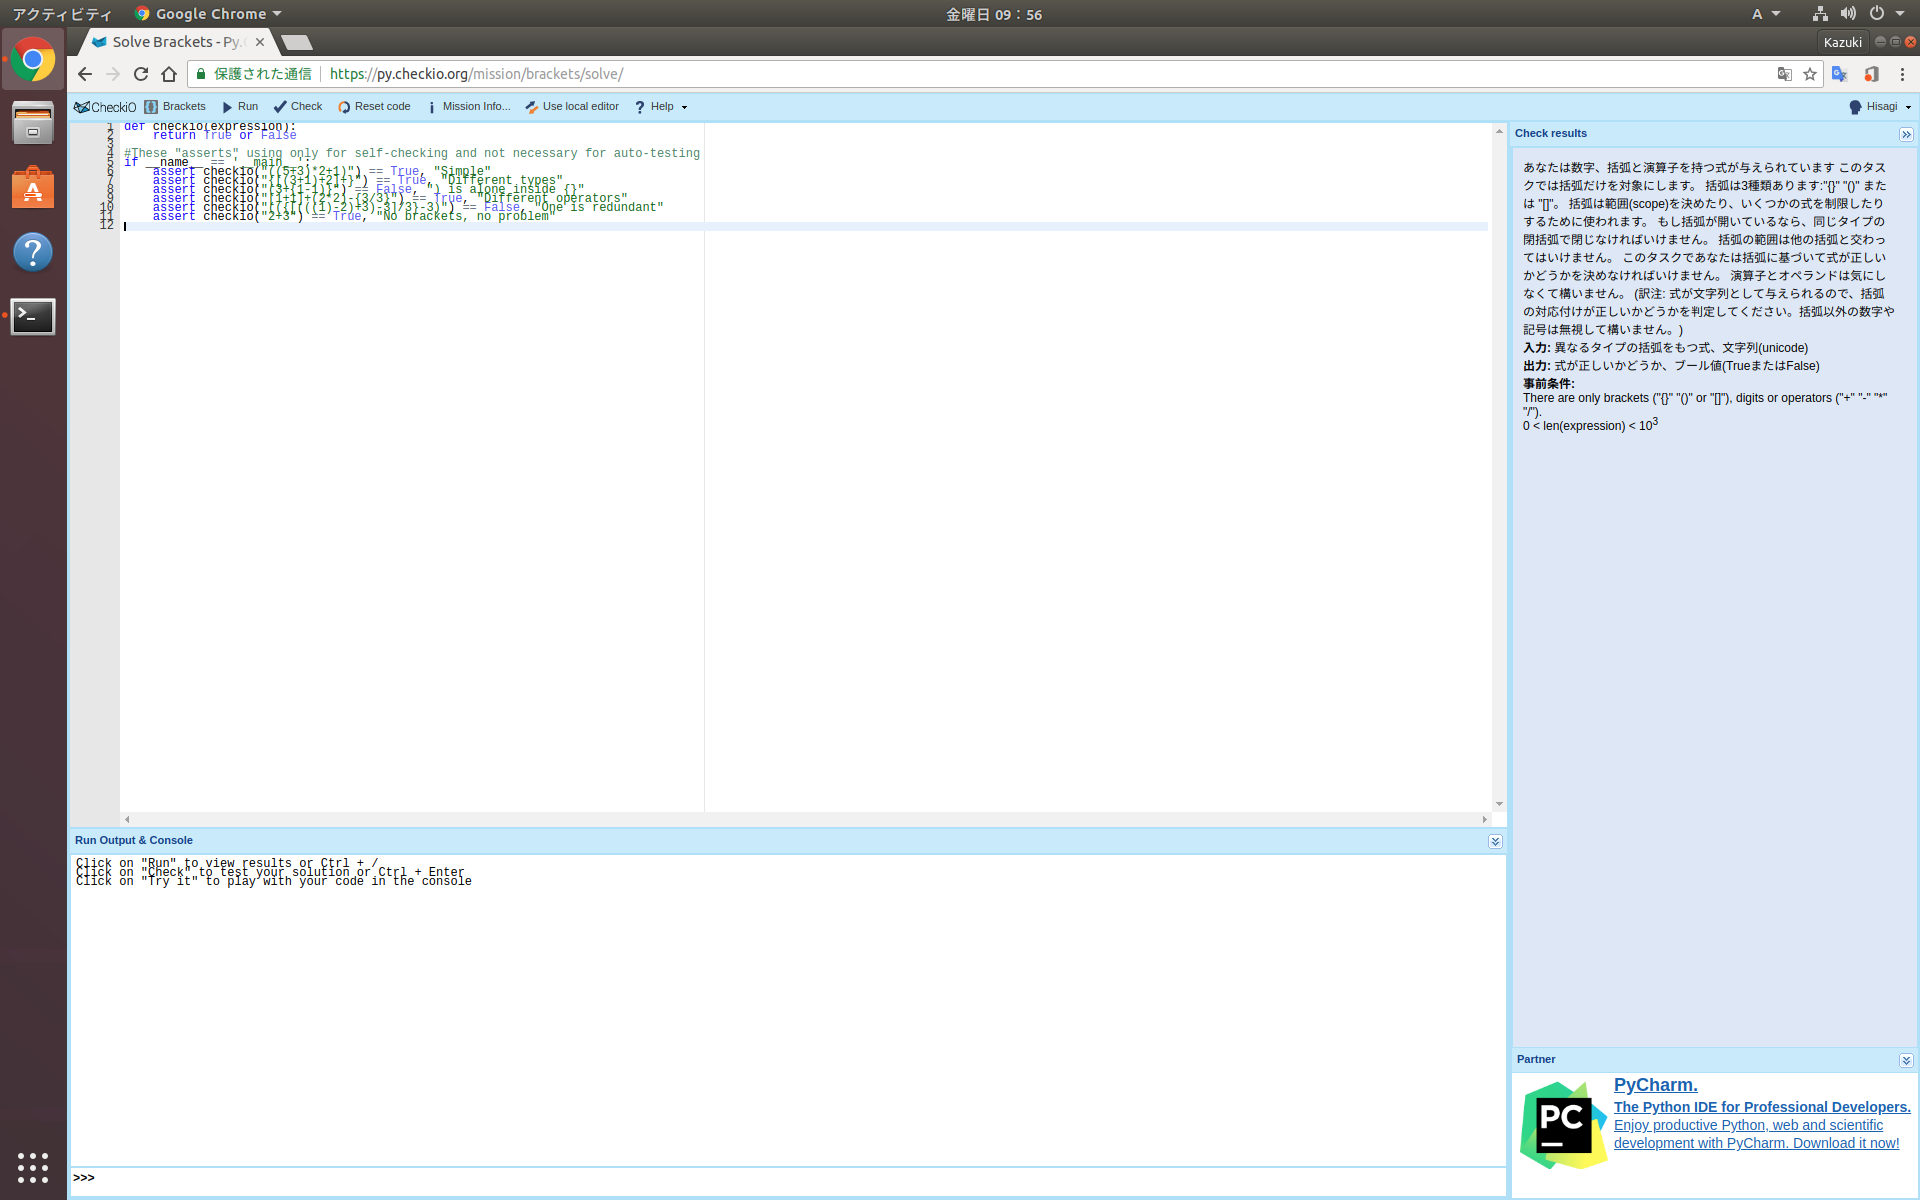 Web editor font rendering bug - python coding challenges